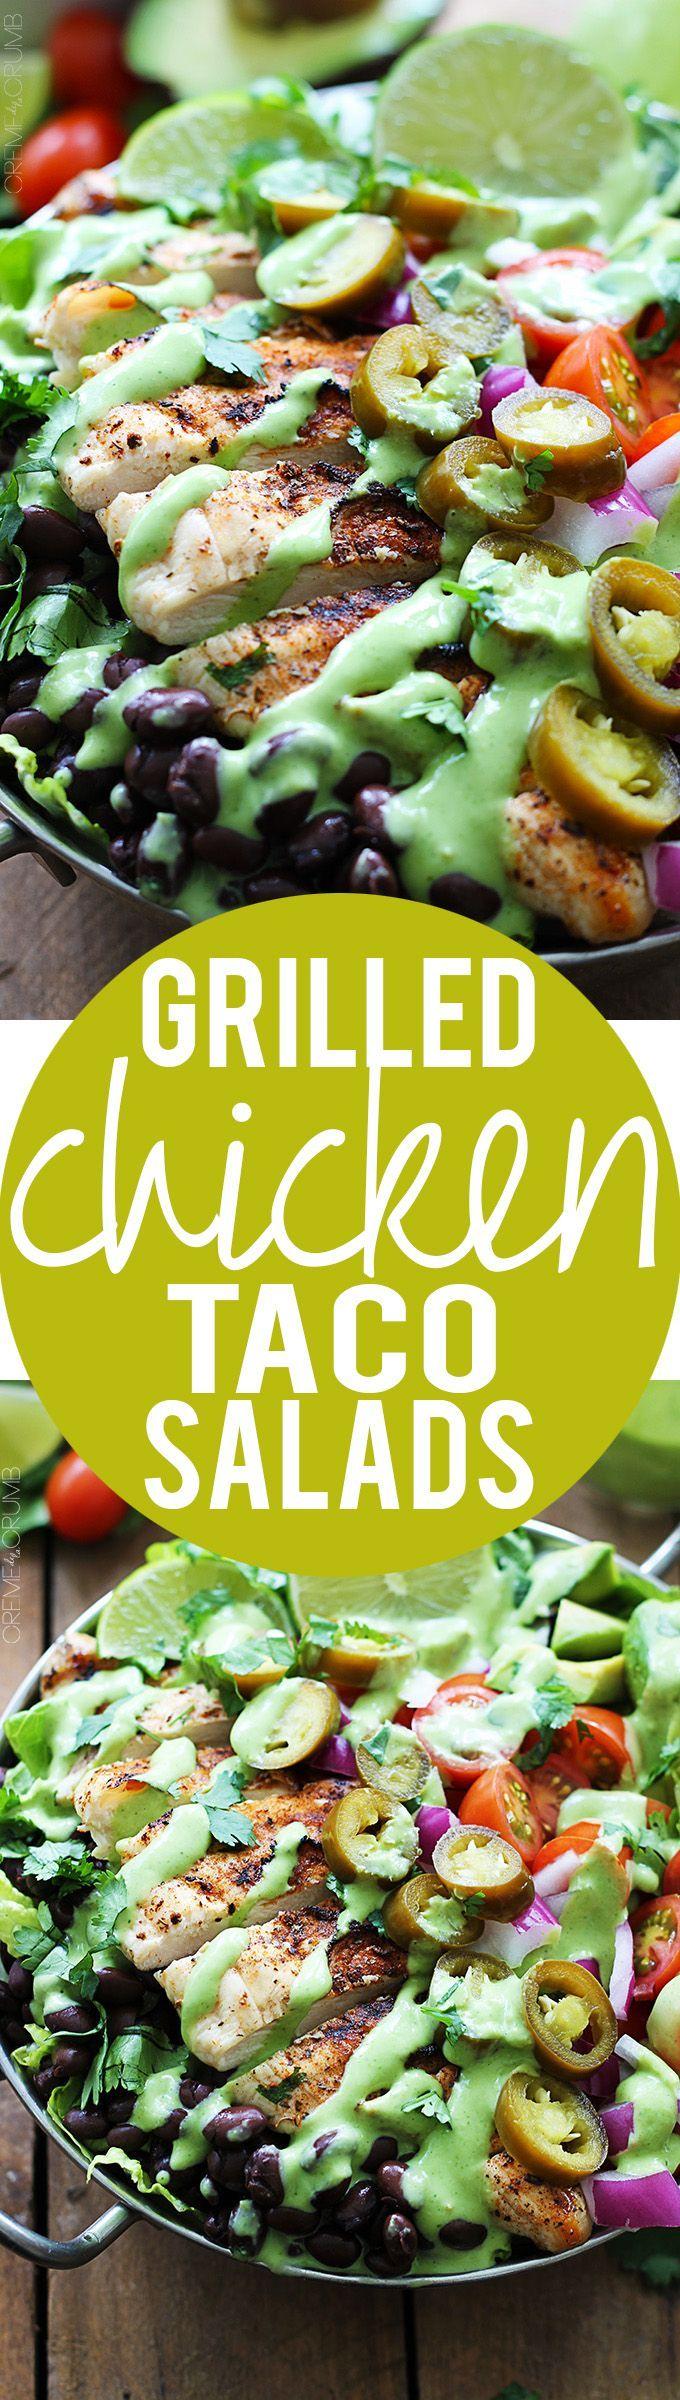 Grilled Chicken Taco Salads with Cilantro Lime Jalapeño Dressing | Creme de la Crumb